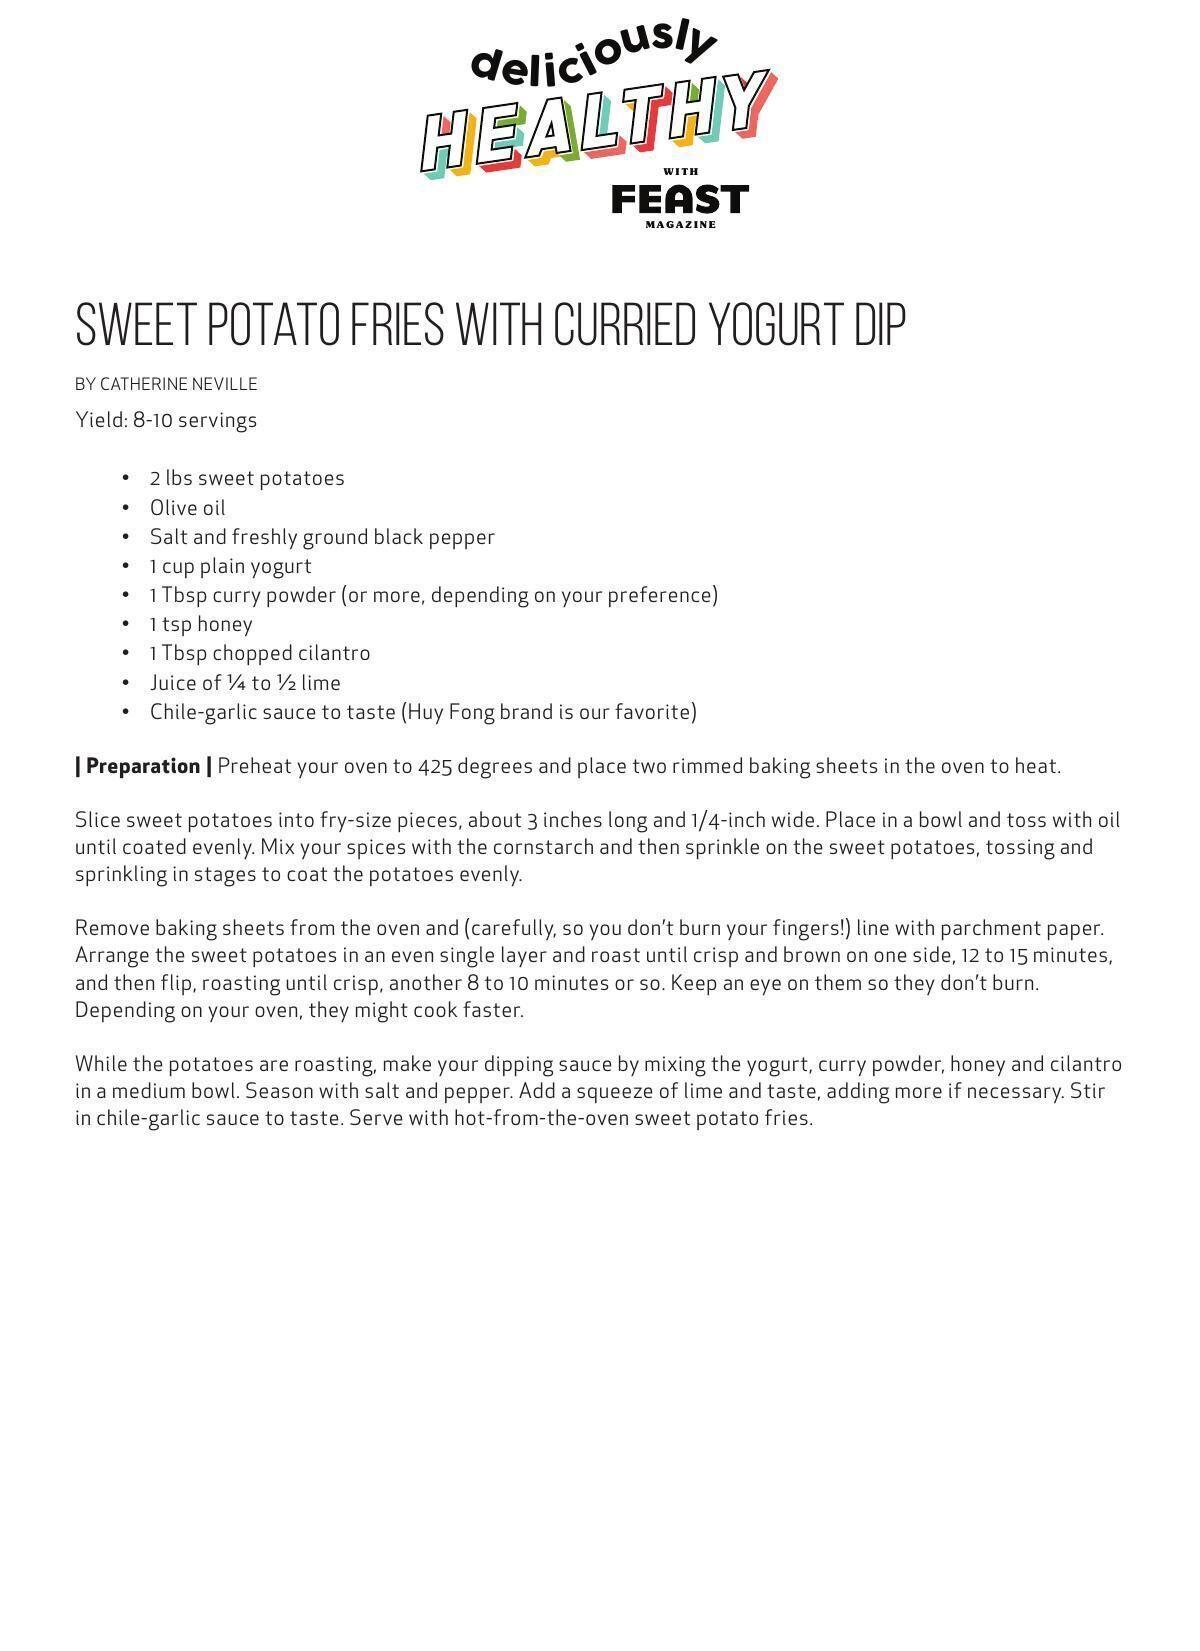 Download this sweet potato fries and curried yogurt dip recipe